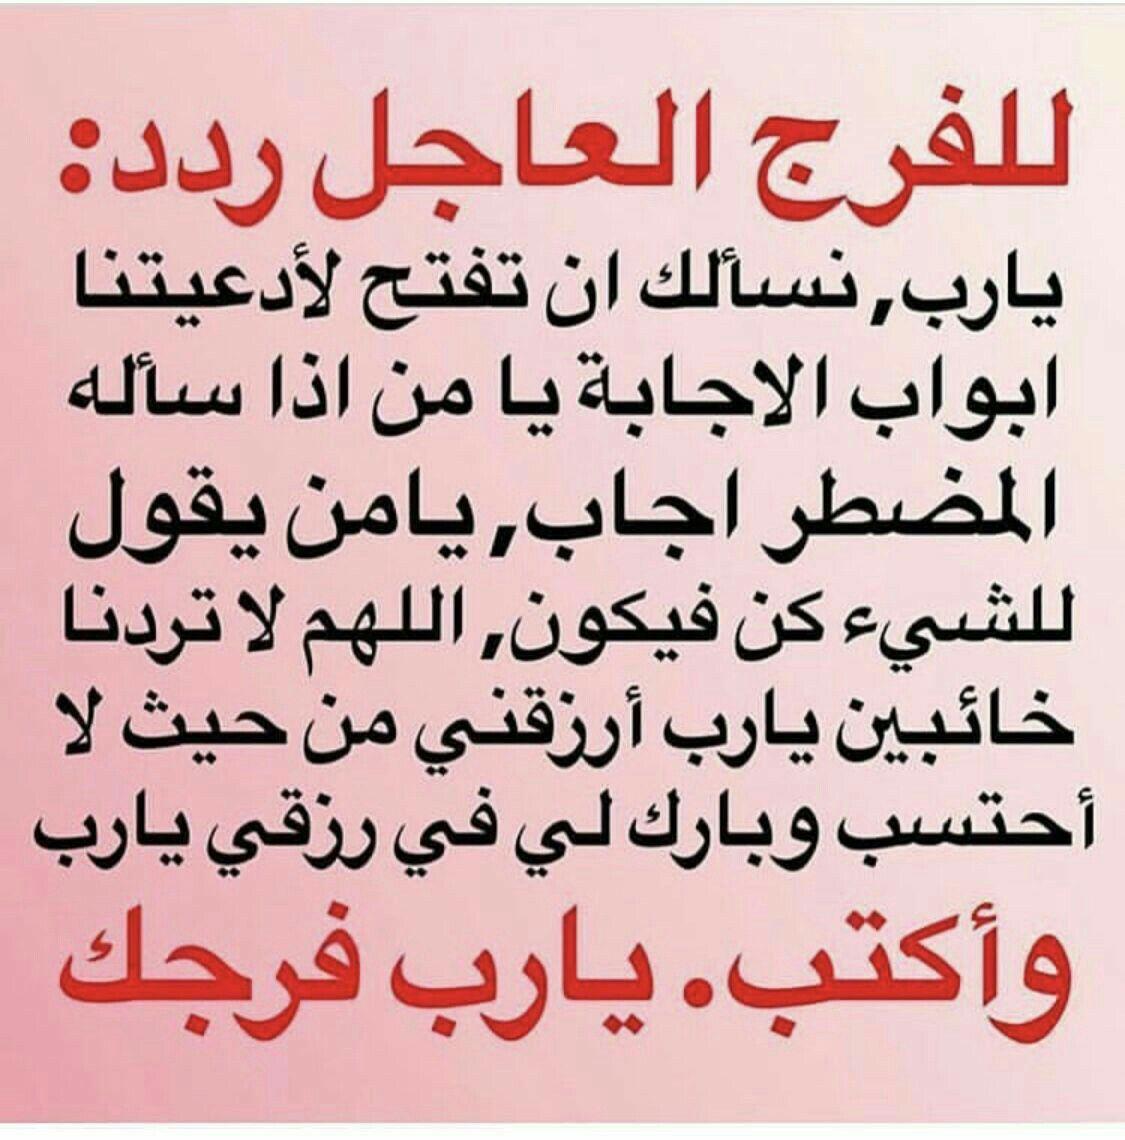 Epingle Par Wihouu Mkalcha Sur ادعية En 2020 Doua Ramadan Coran Apprendre L Islam